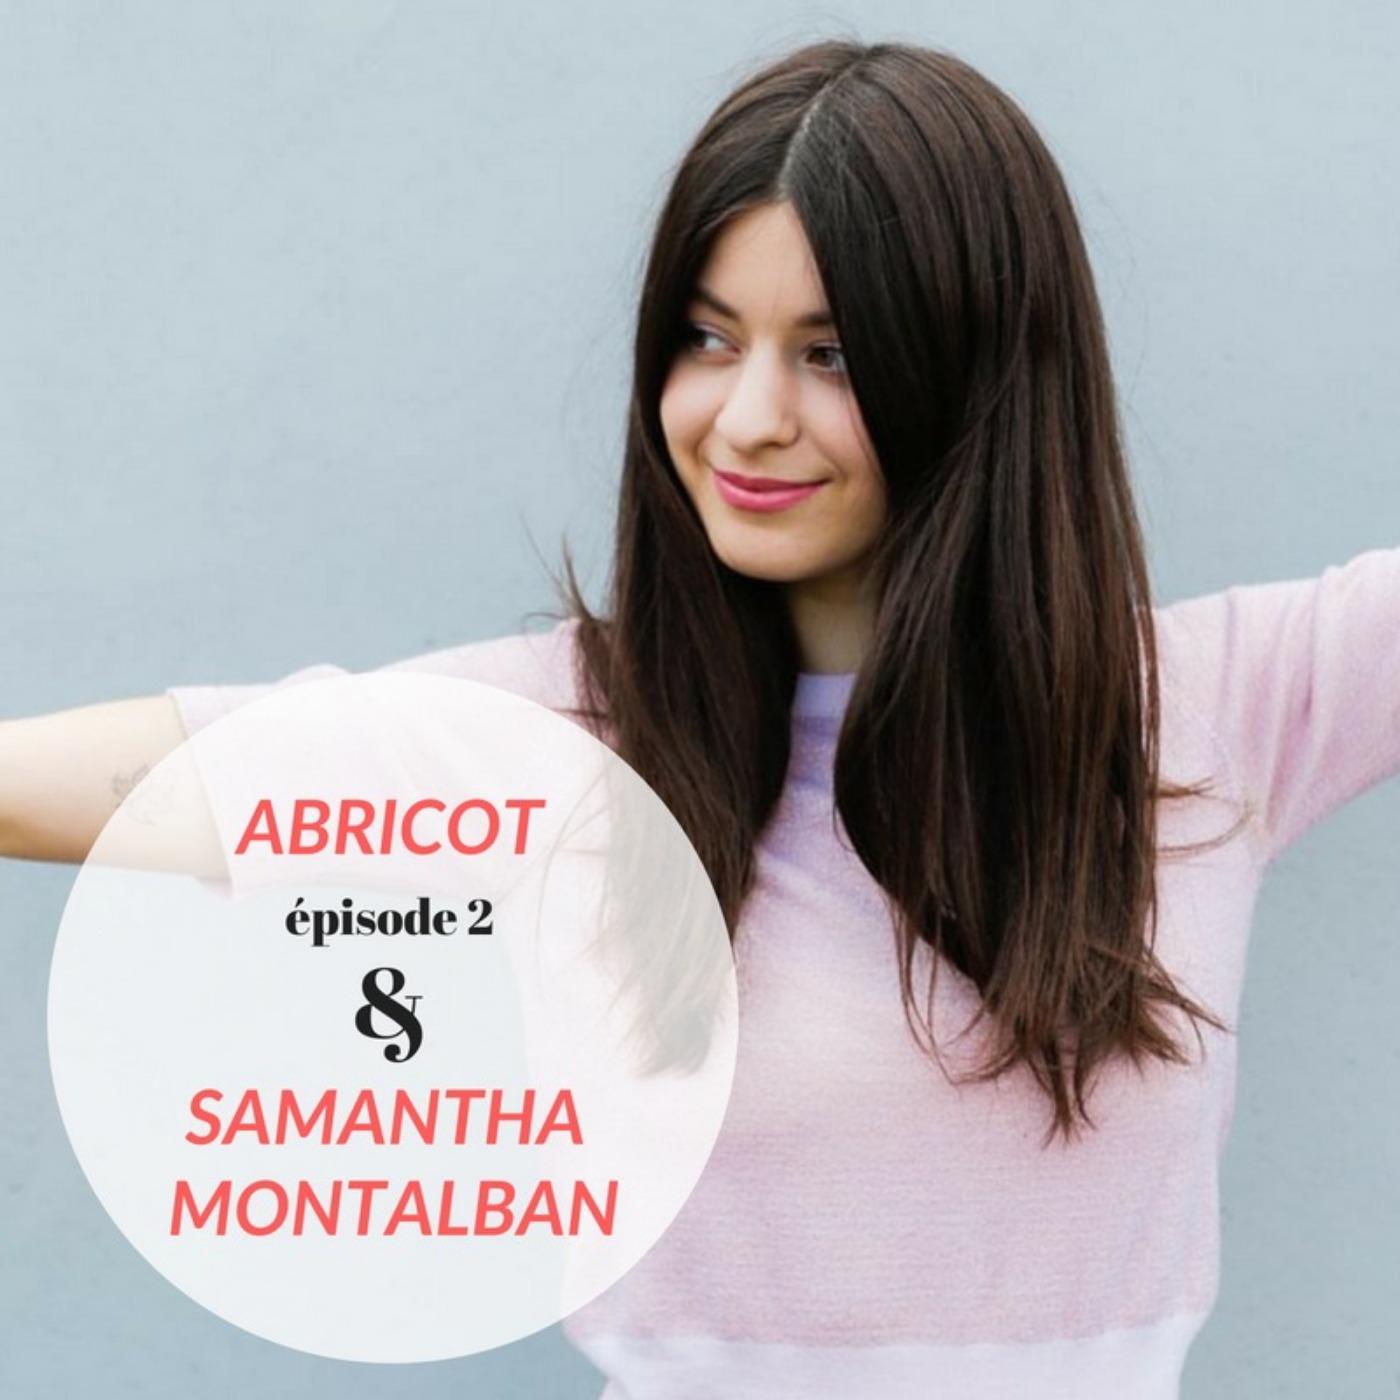 Samantha Montalban - Mina Storm - Audace, lingerie et dragons